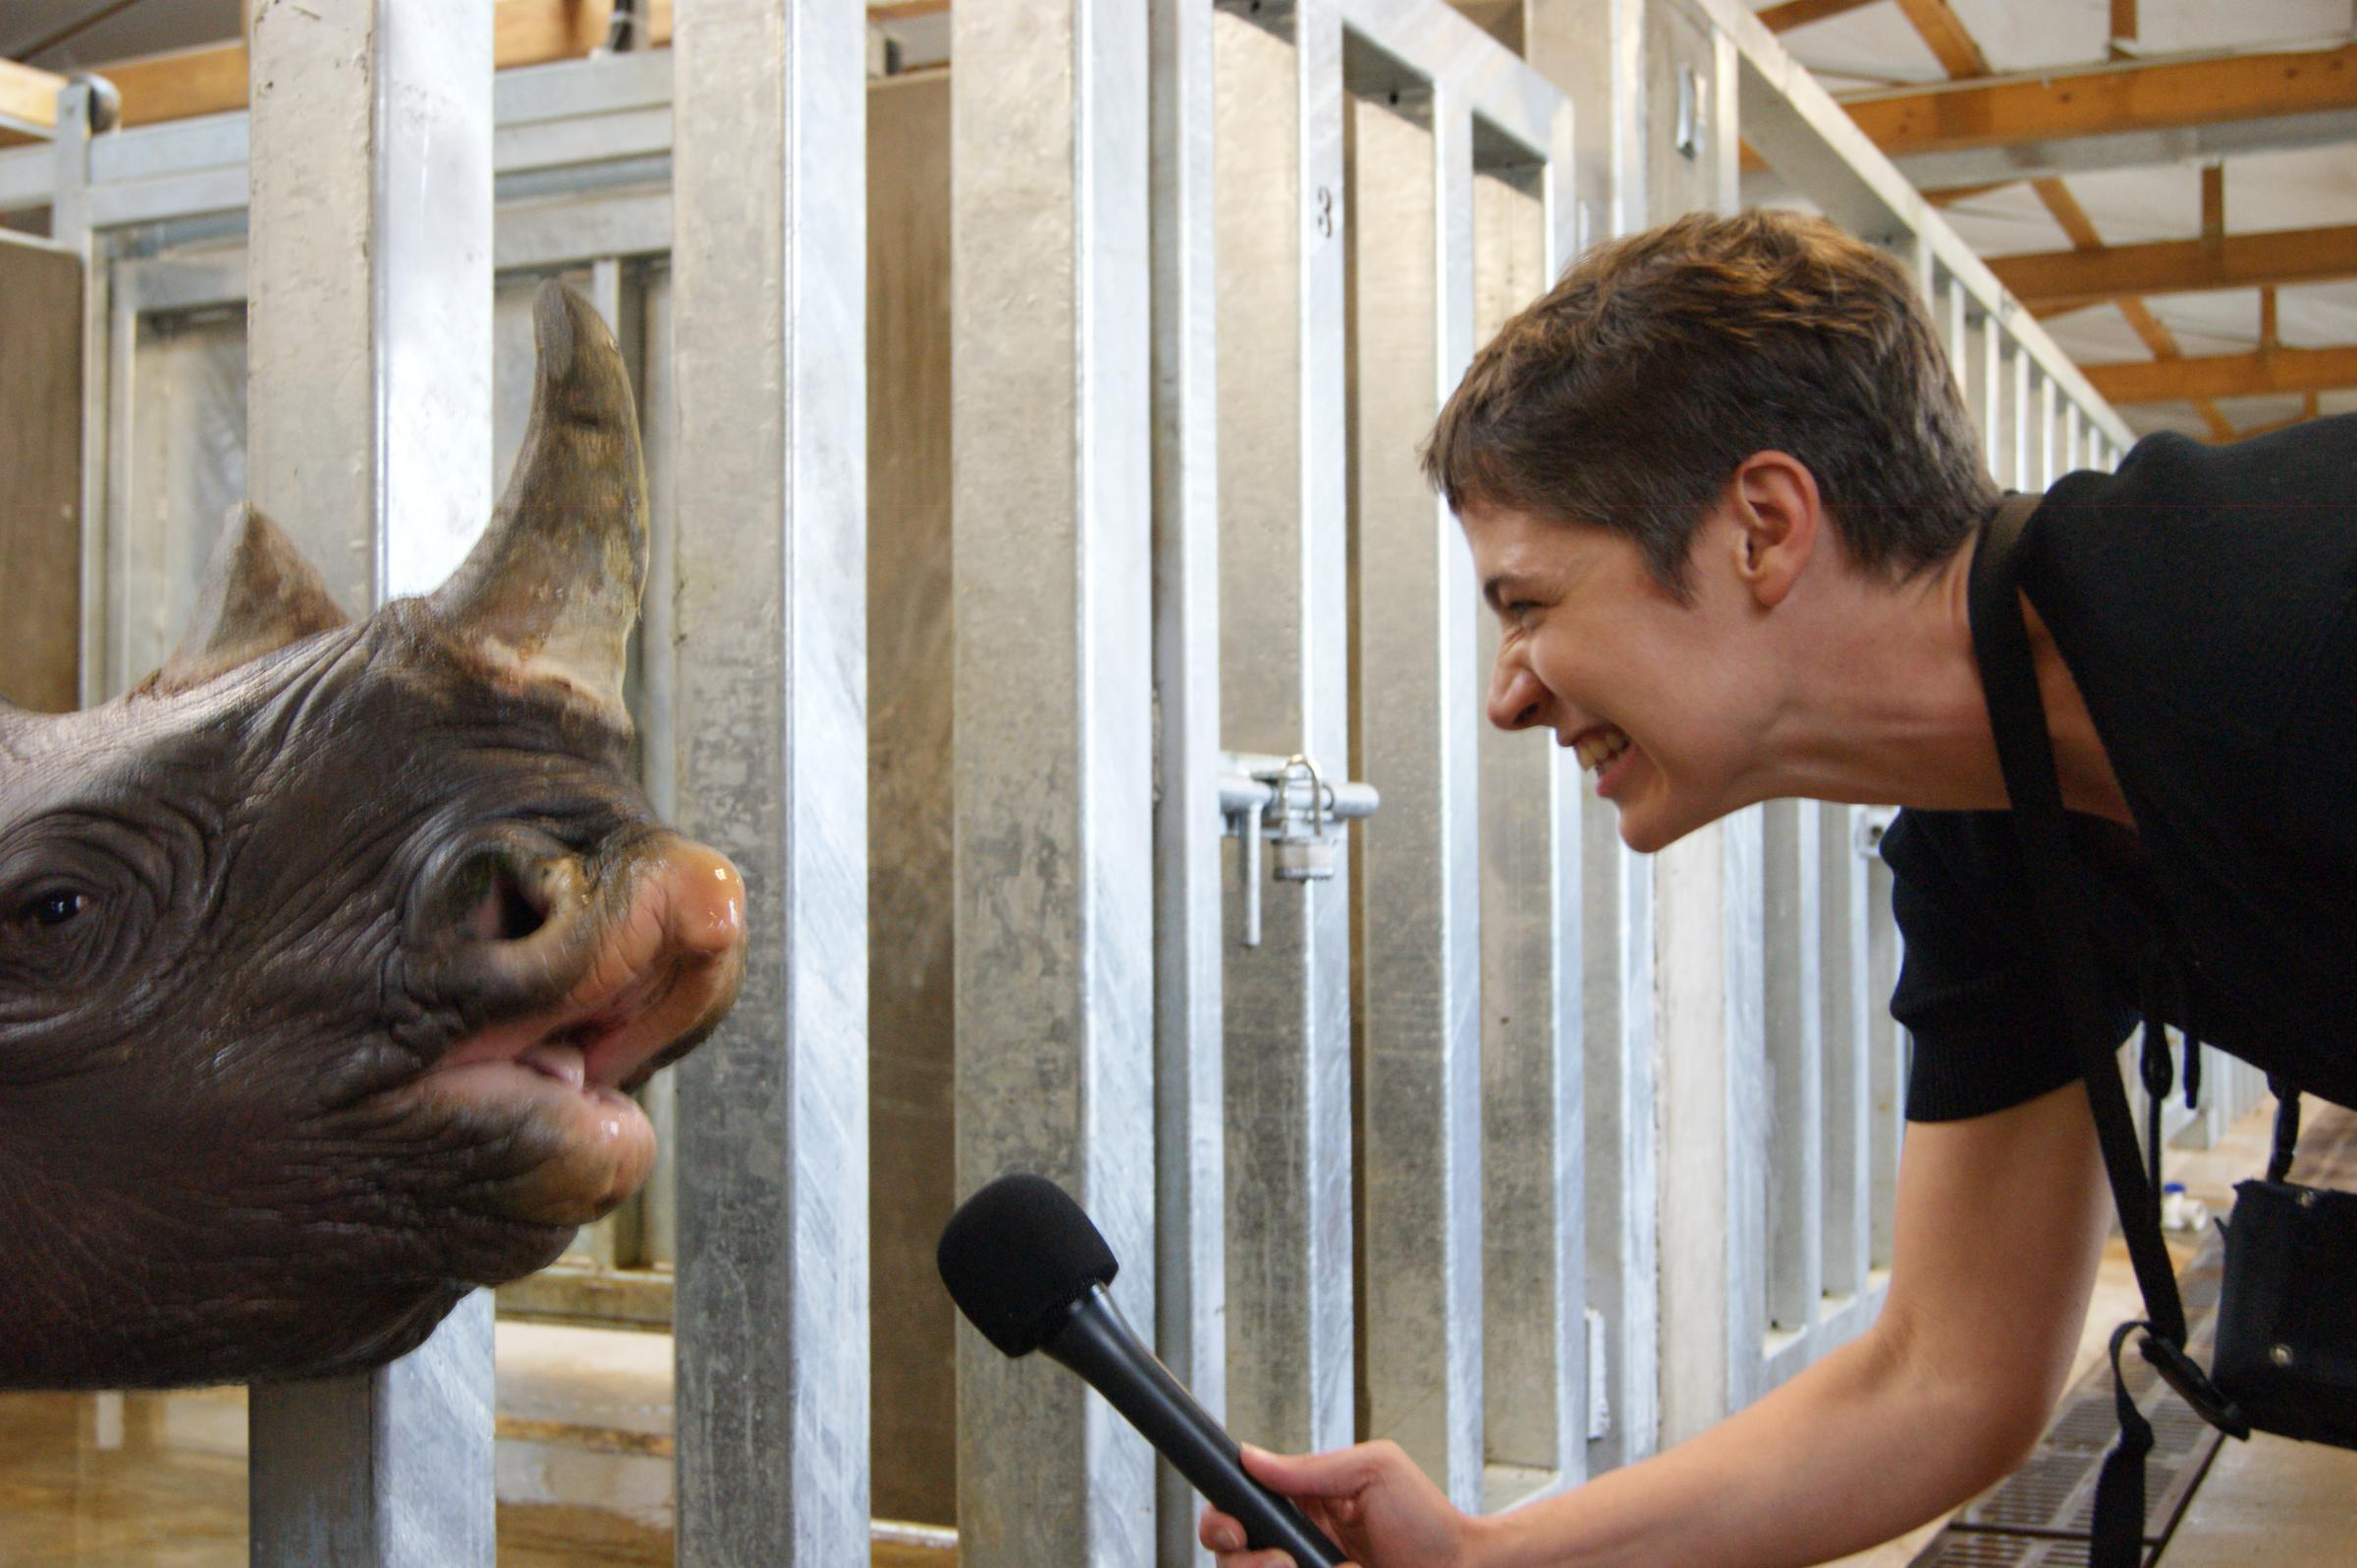 Blank Park Zoo Calendar : Conservation at the blank park zoo iowa public radio